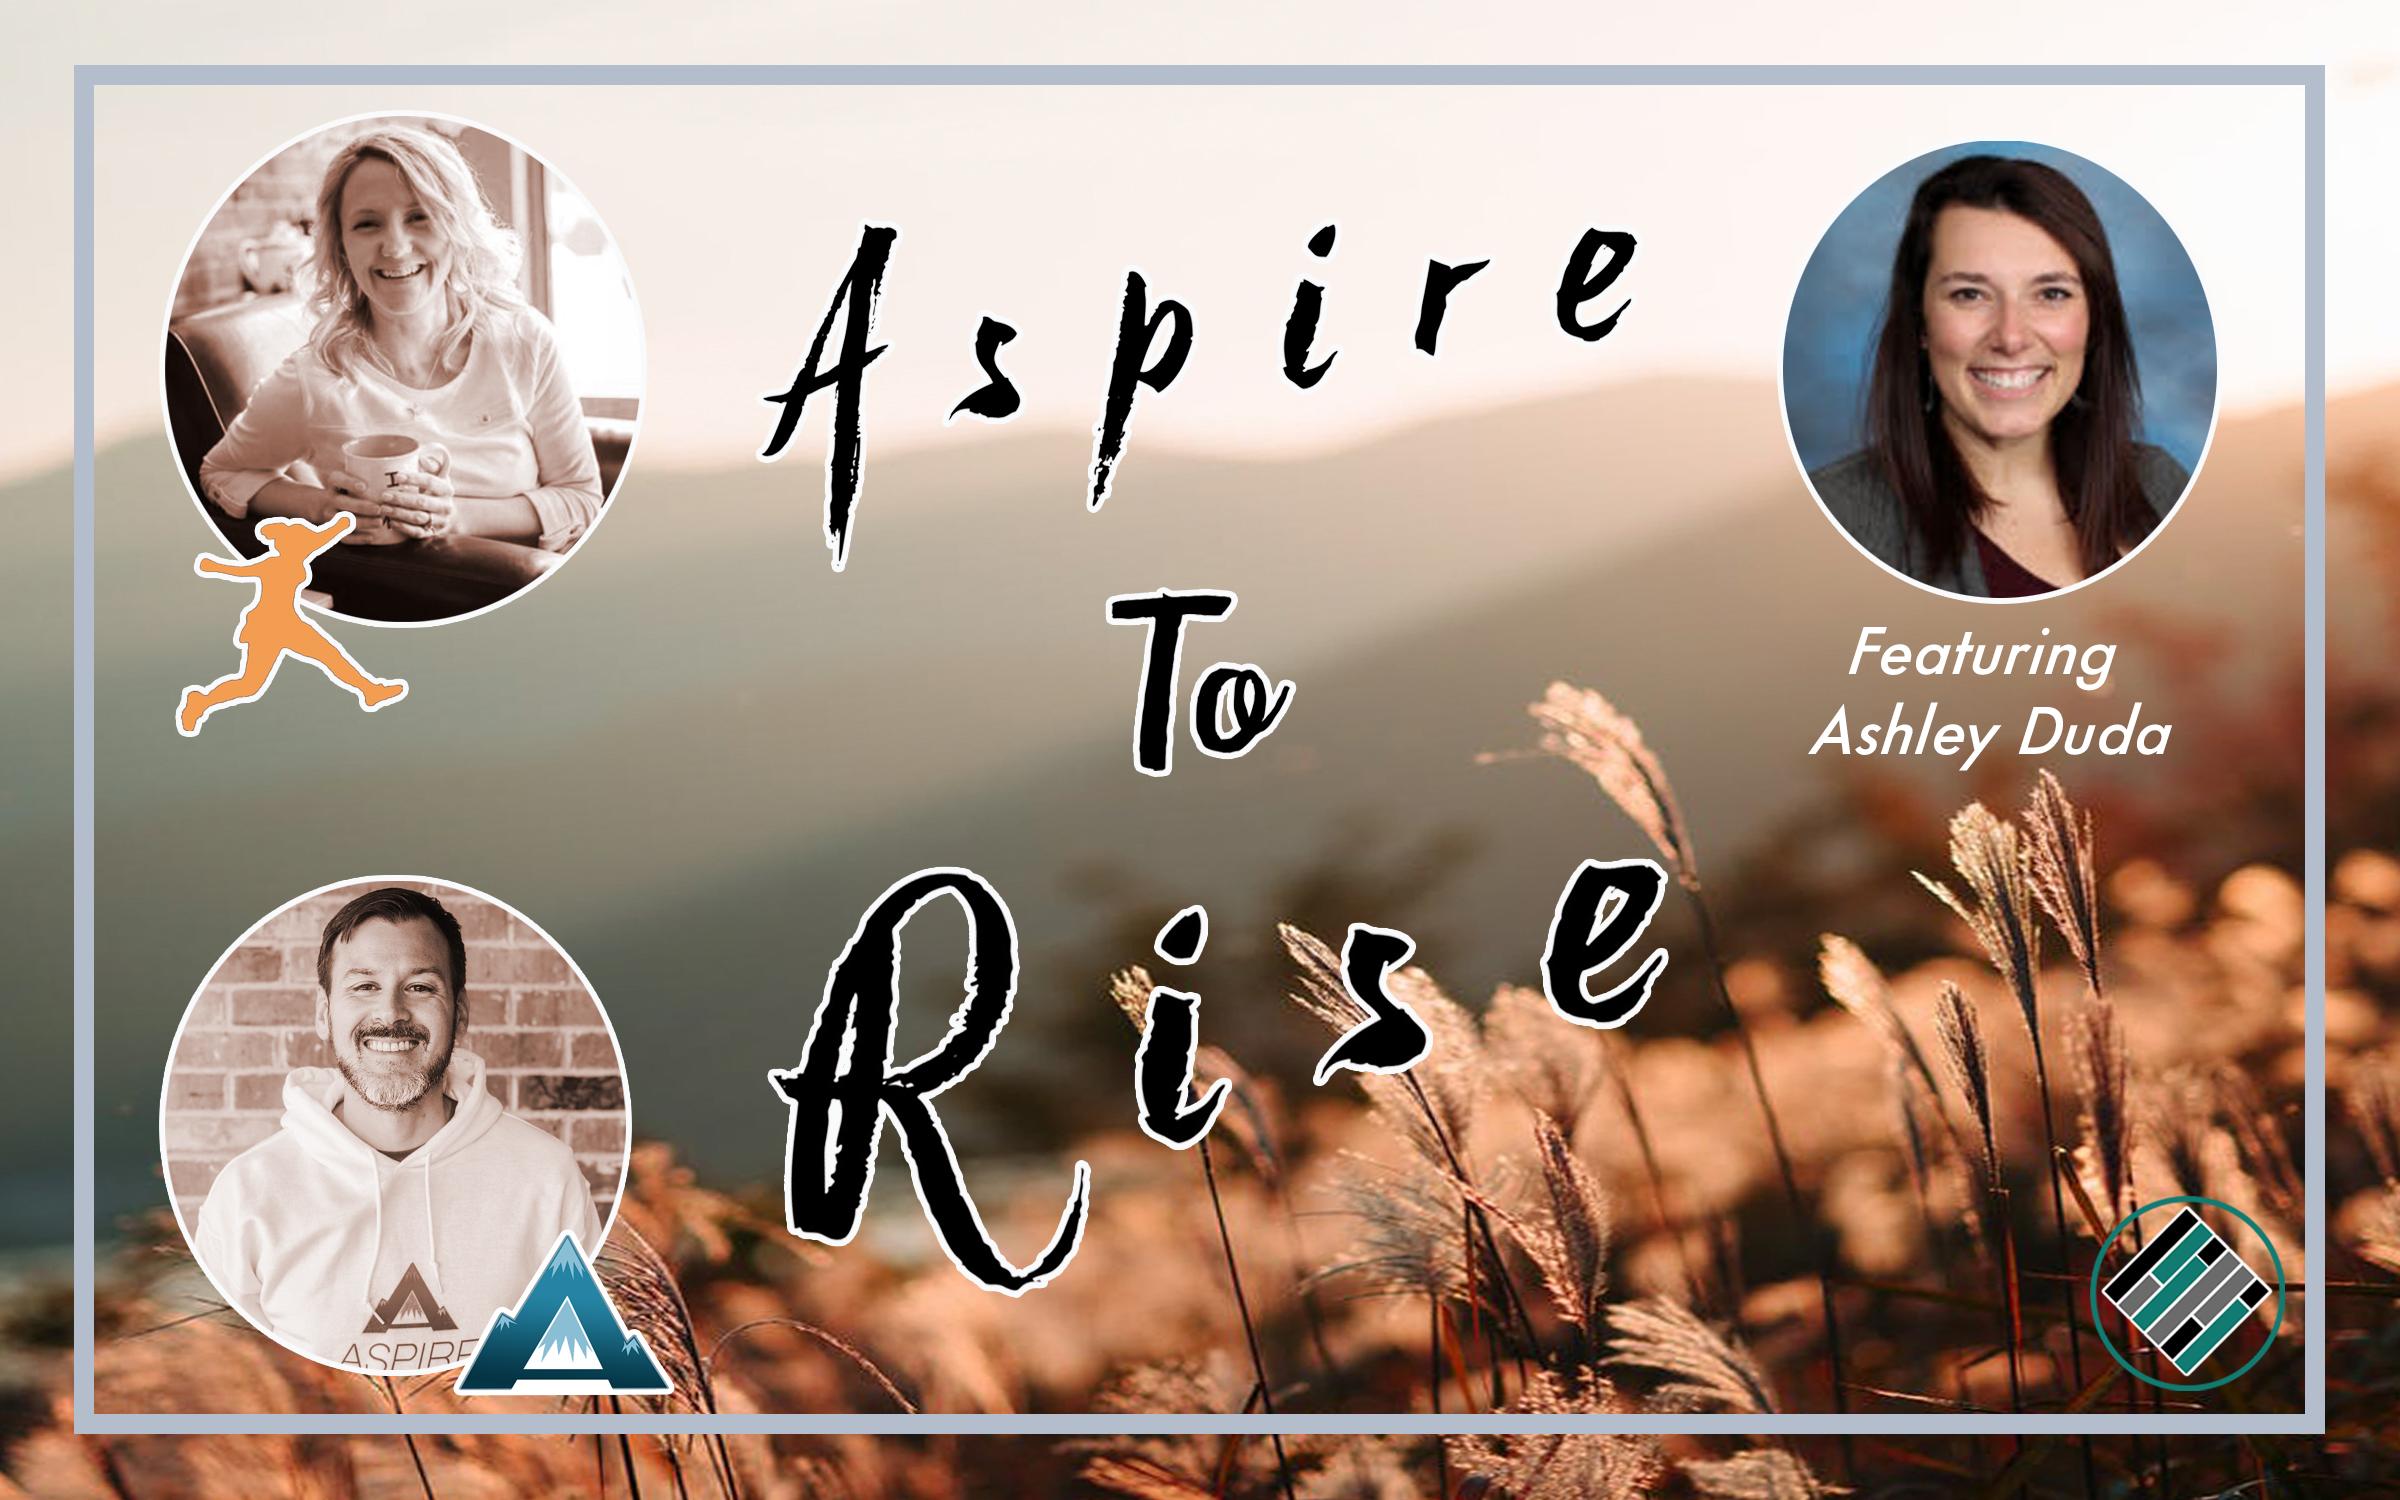 Joshua Stamper, Sarah Johnson, Aspire: The Leadership Development Podcast, Teach Better, Aspire to Rise, Ashley Duda